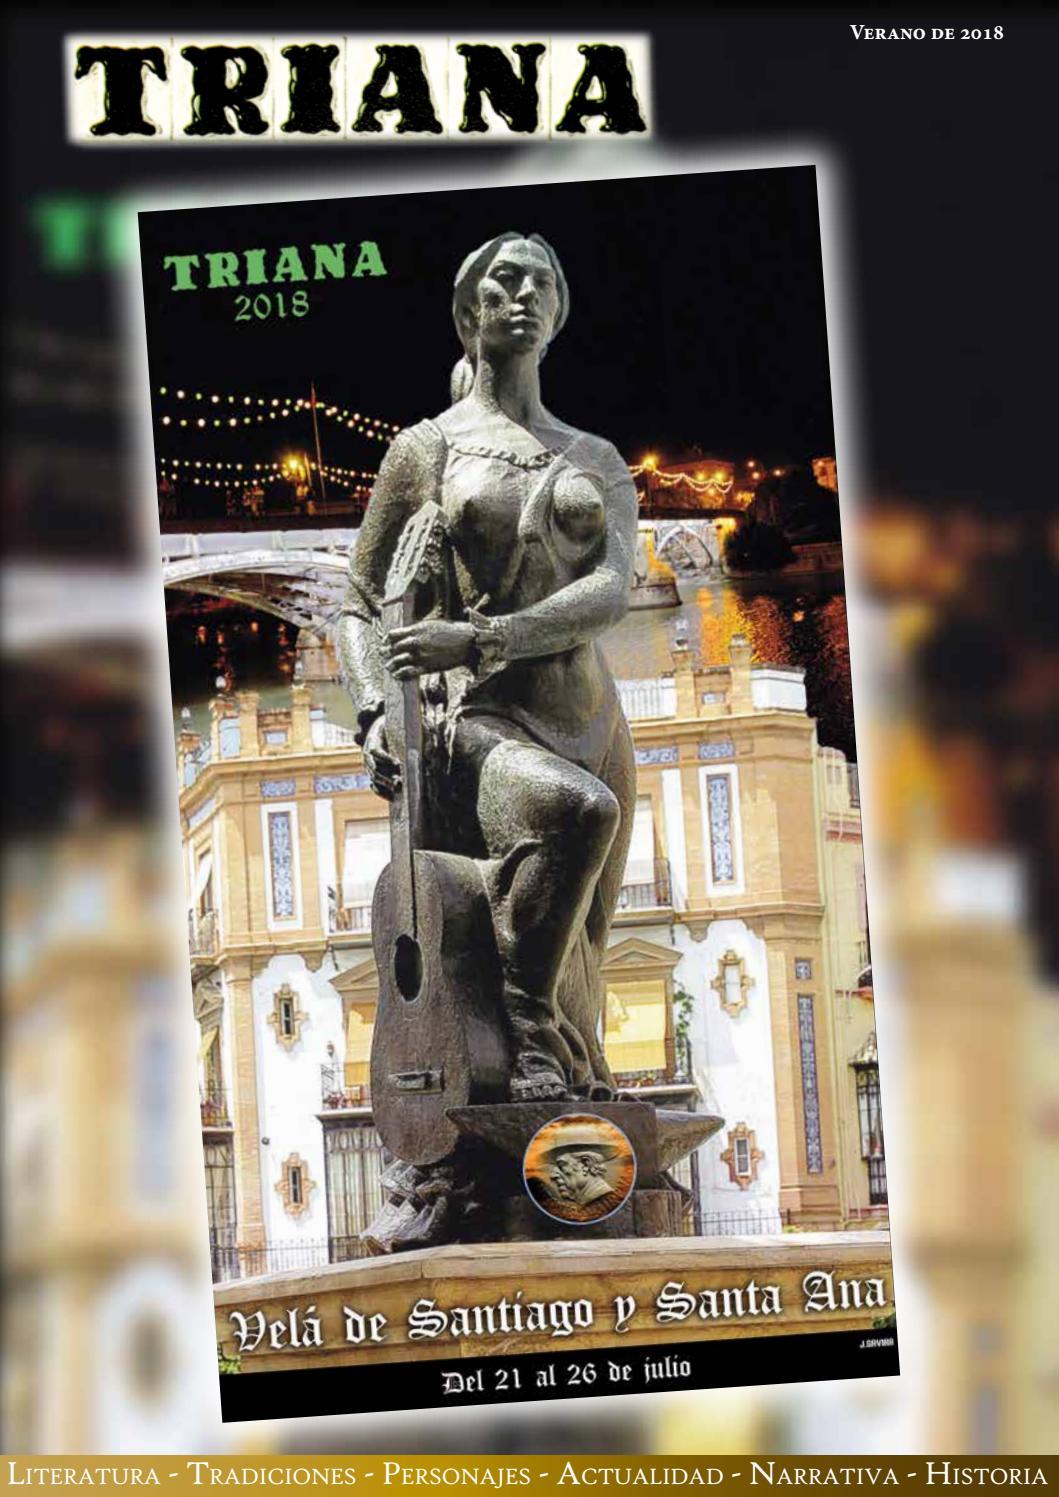 d315452ac Revista Triana - Verano 2018 by Ayuntamiento de Sevilla - issuu